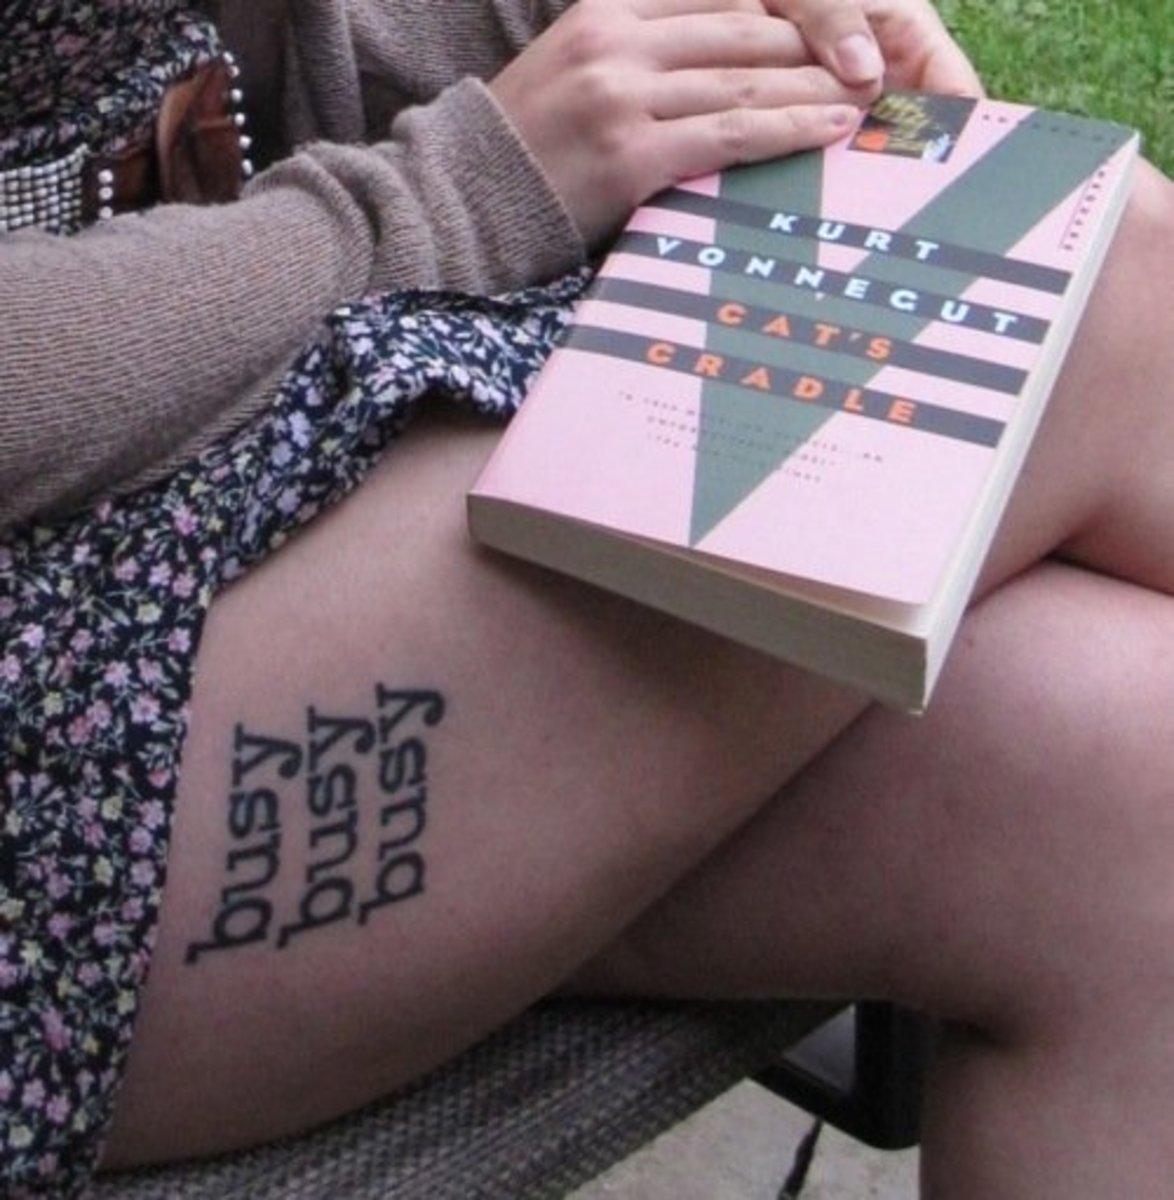 idei-dlya-tatuirovok - Татуировка Идеи: Курт Воннегут -  - фото